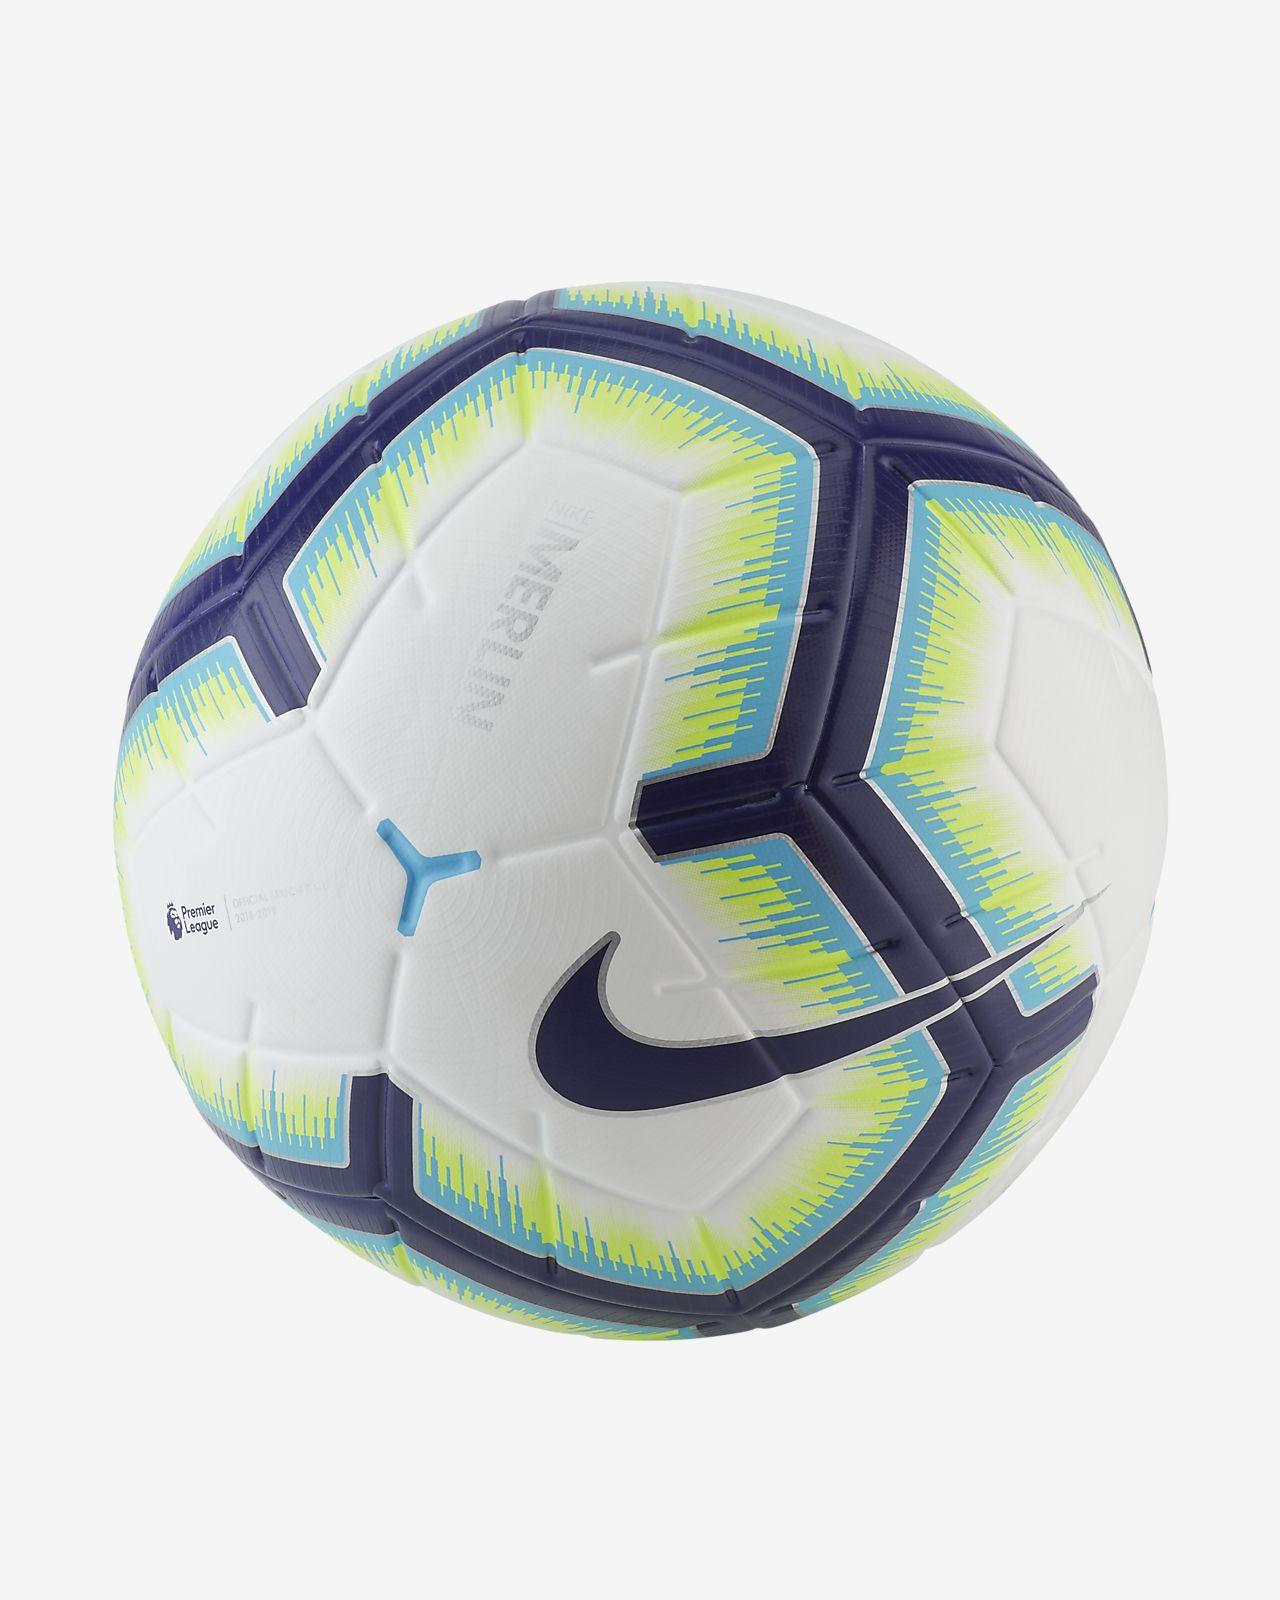 info for 389f5 14e1f Low Resolution Premier League Merlin Fußball Premier League Merlin Fußball